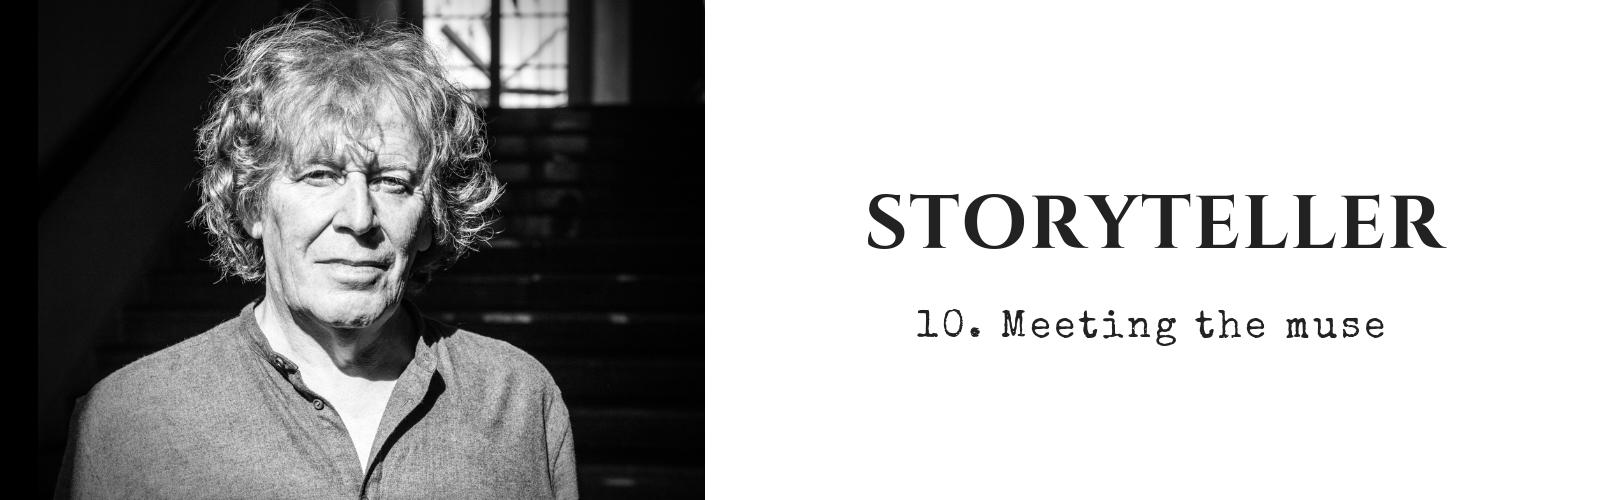 Storyteller 10 Meeting the muse